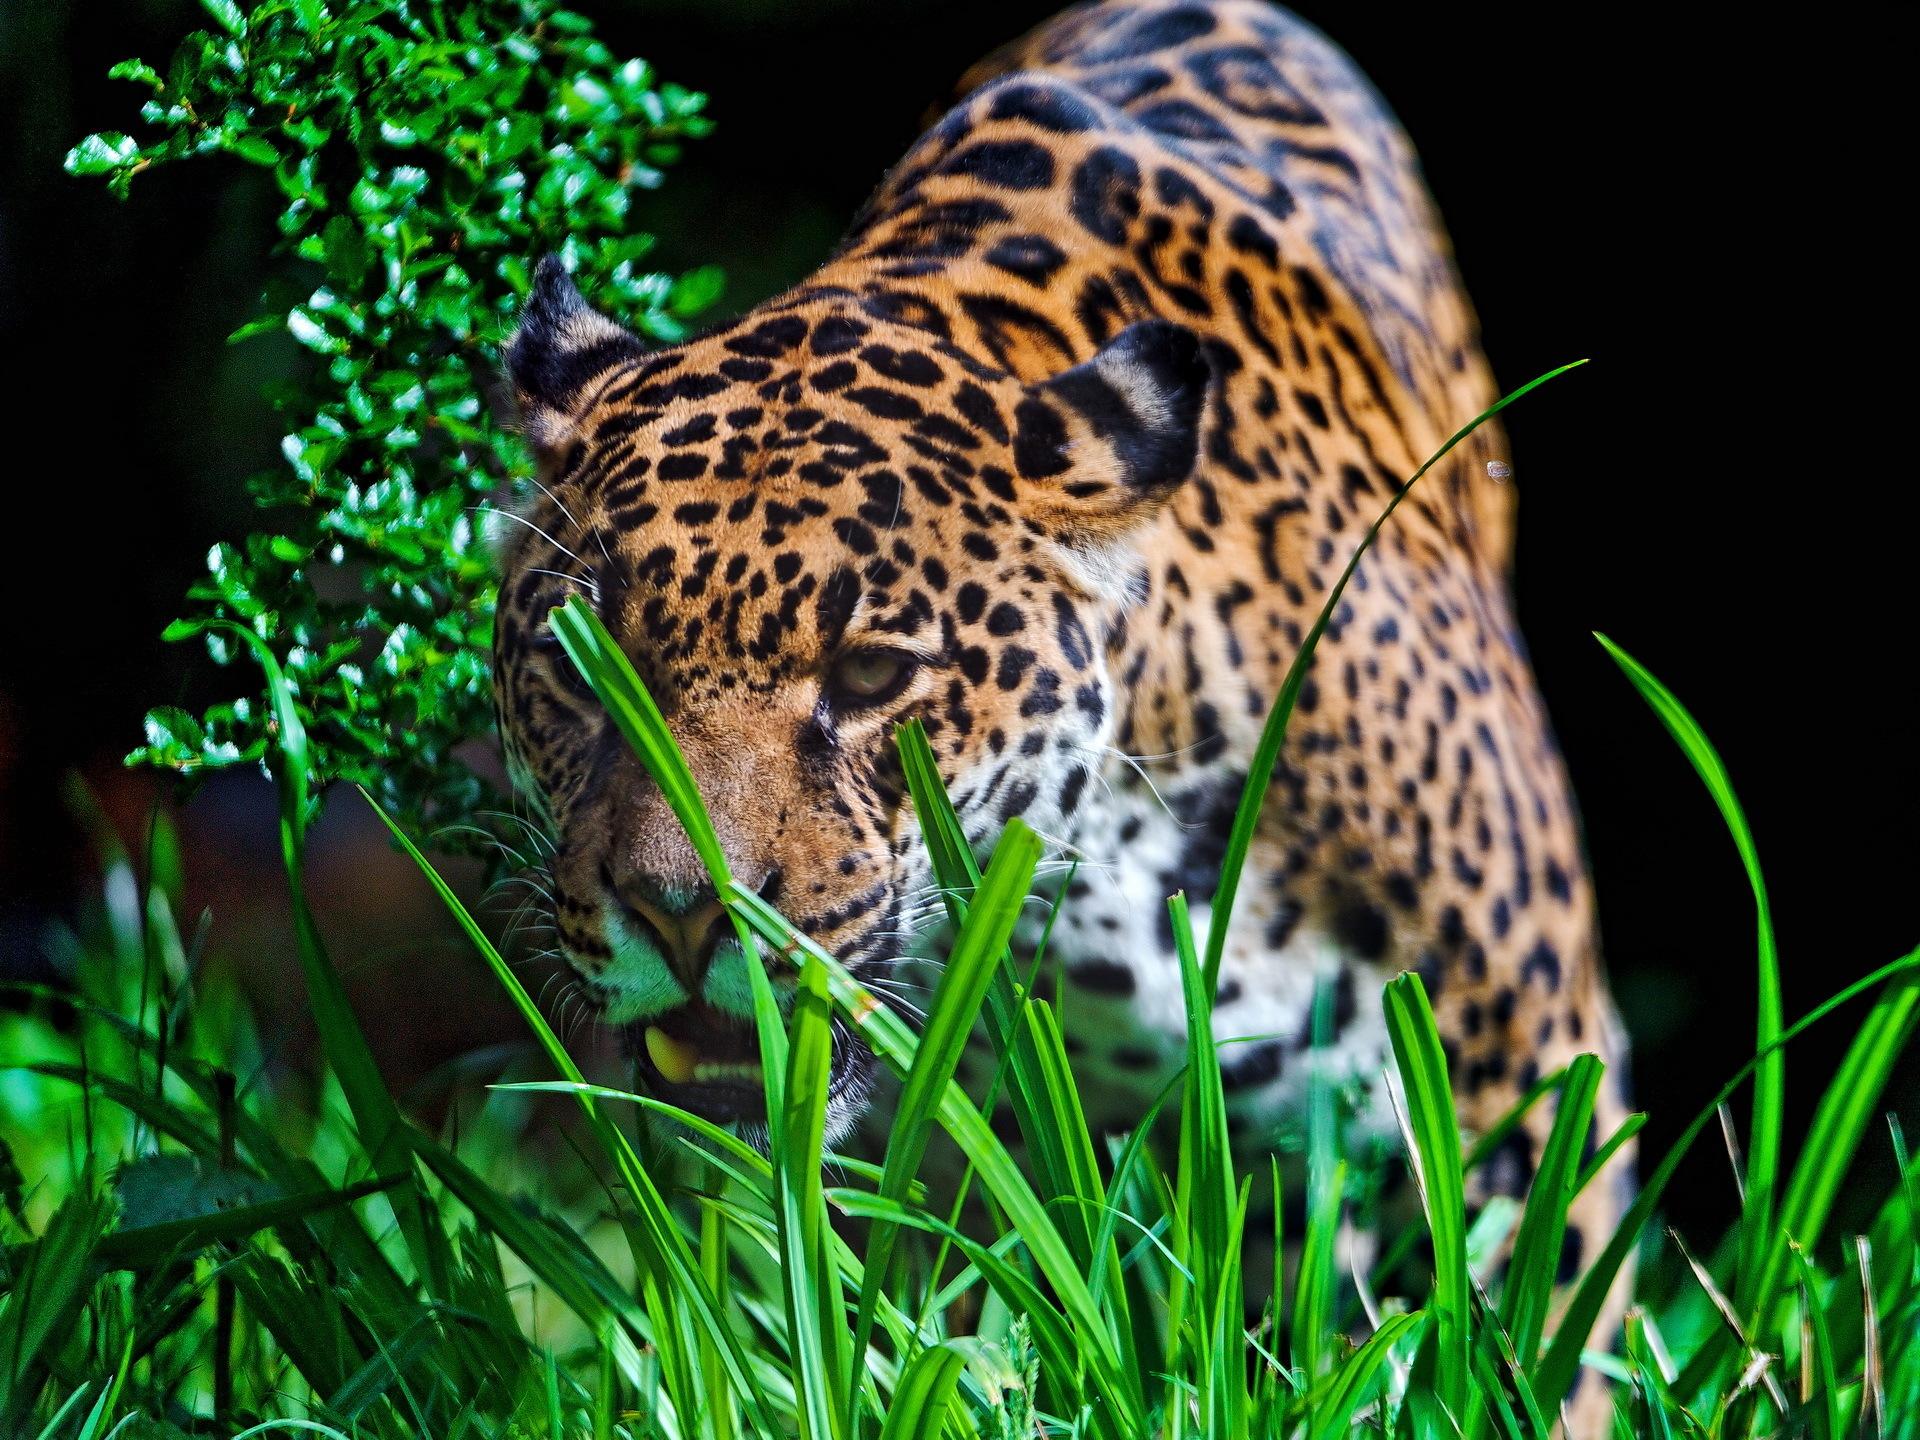 Animals Jaguars Wallpapers Hd Desktop And Mobile: Jaguar Full HD Wallpaper And Background